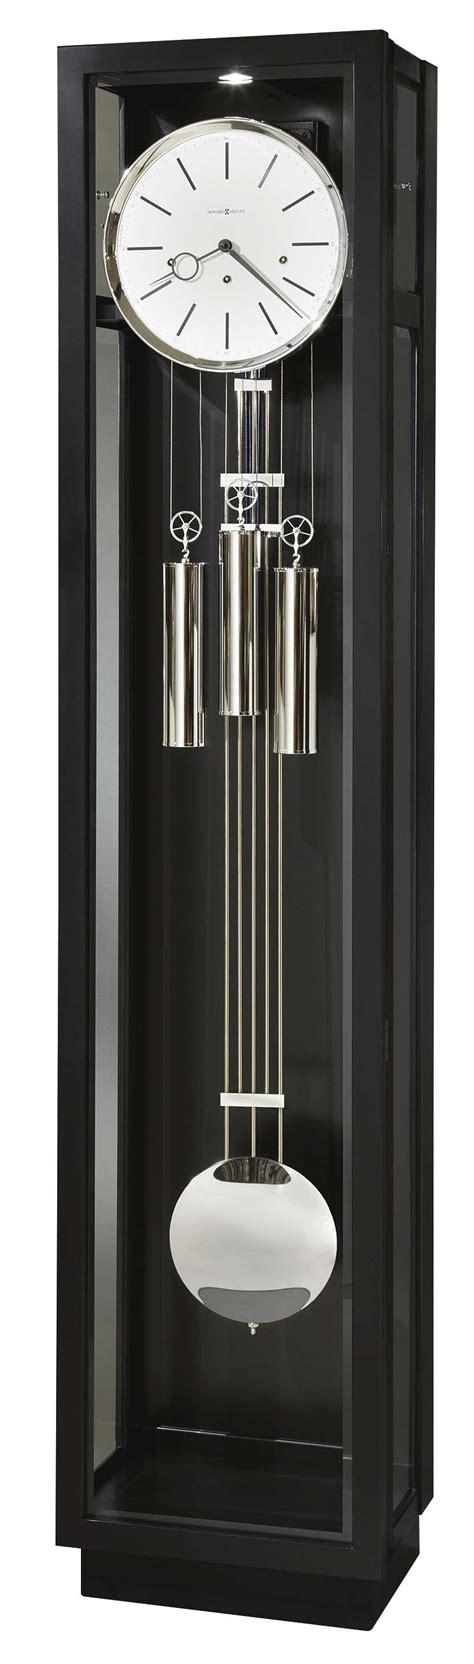 modern floor clocks uk howard miller cameron 611 210 modern floor clock free in